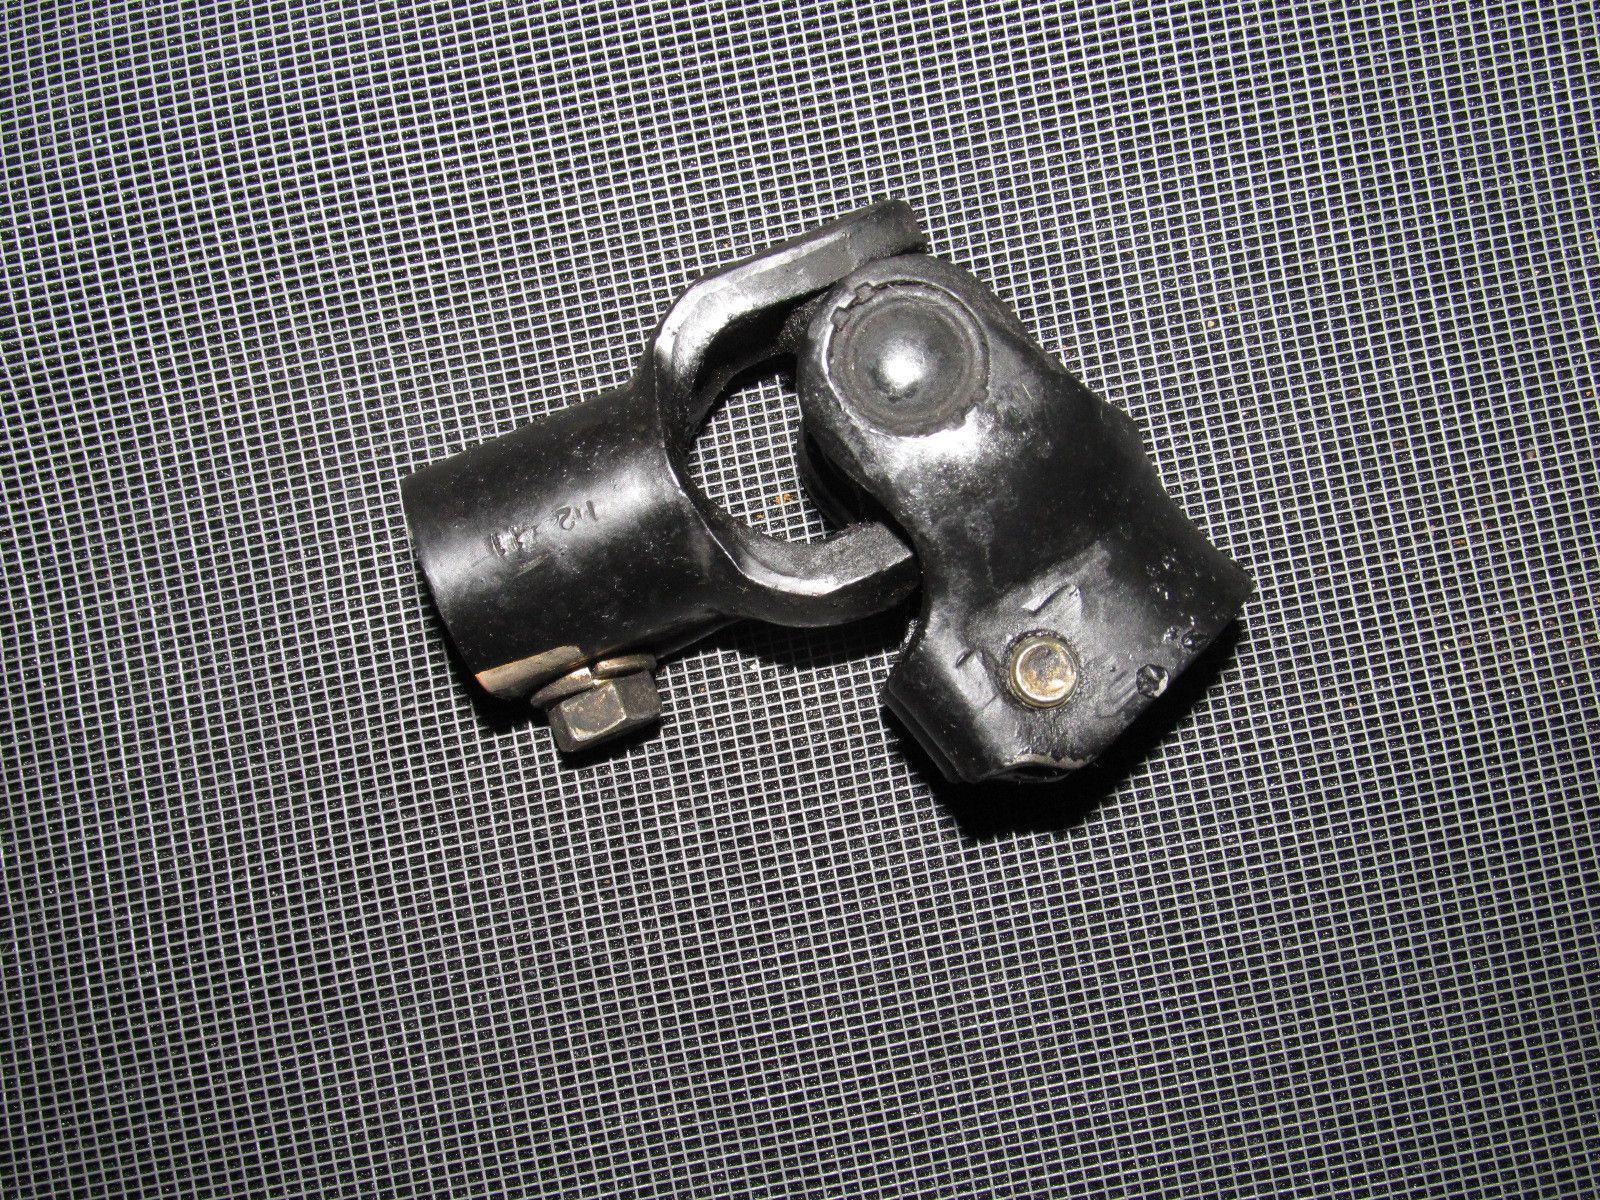 medium resolution of 89 90 91 92 93 94 nissan 240sx oem steering column u joint coupler